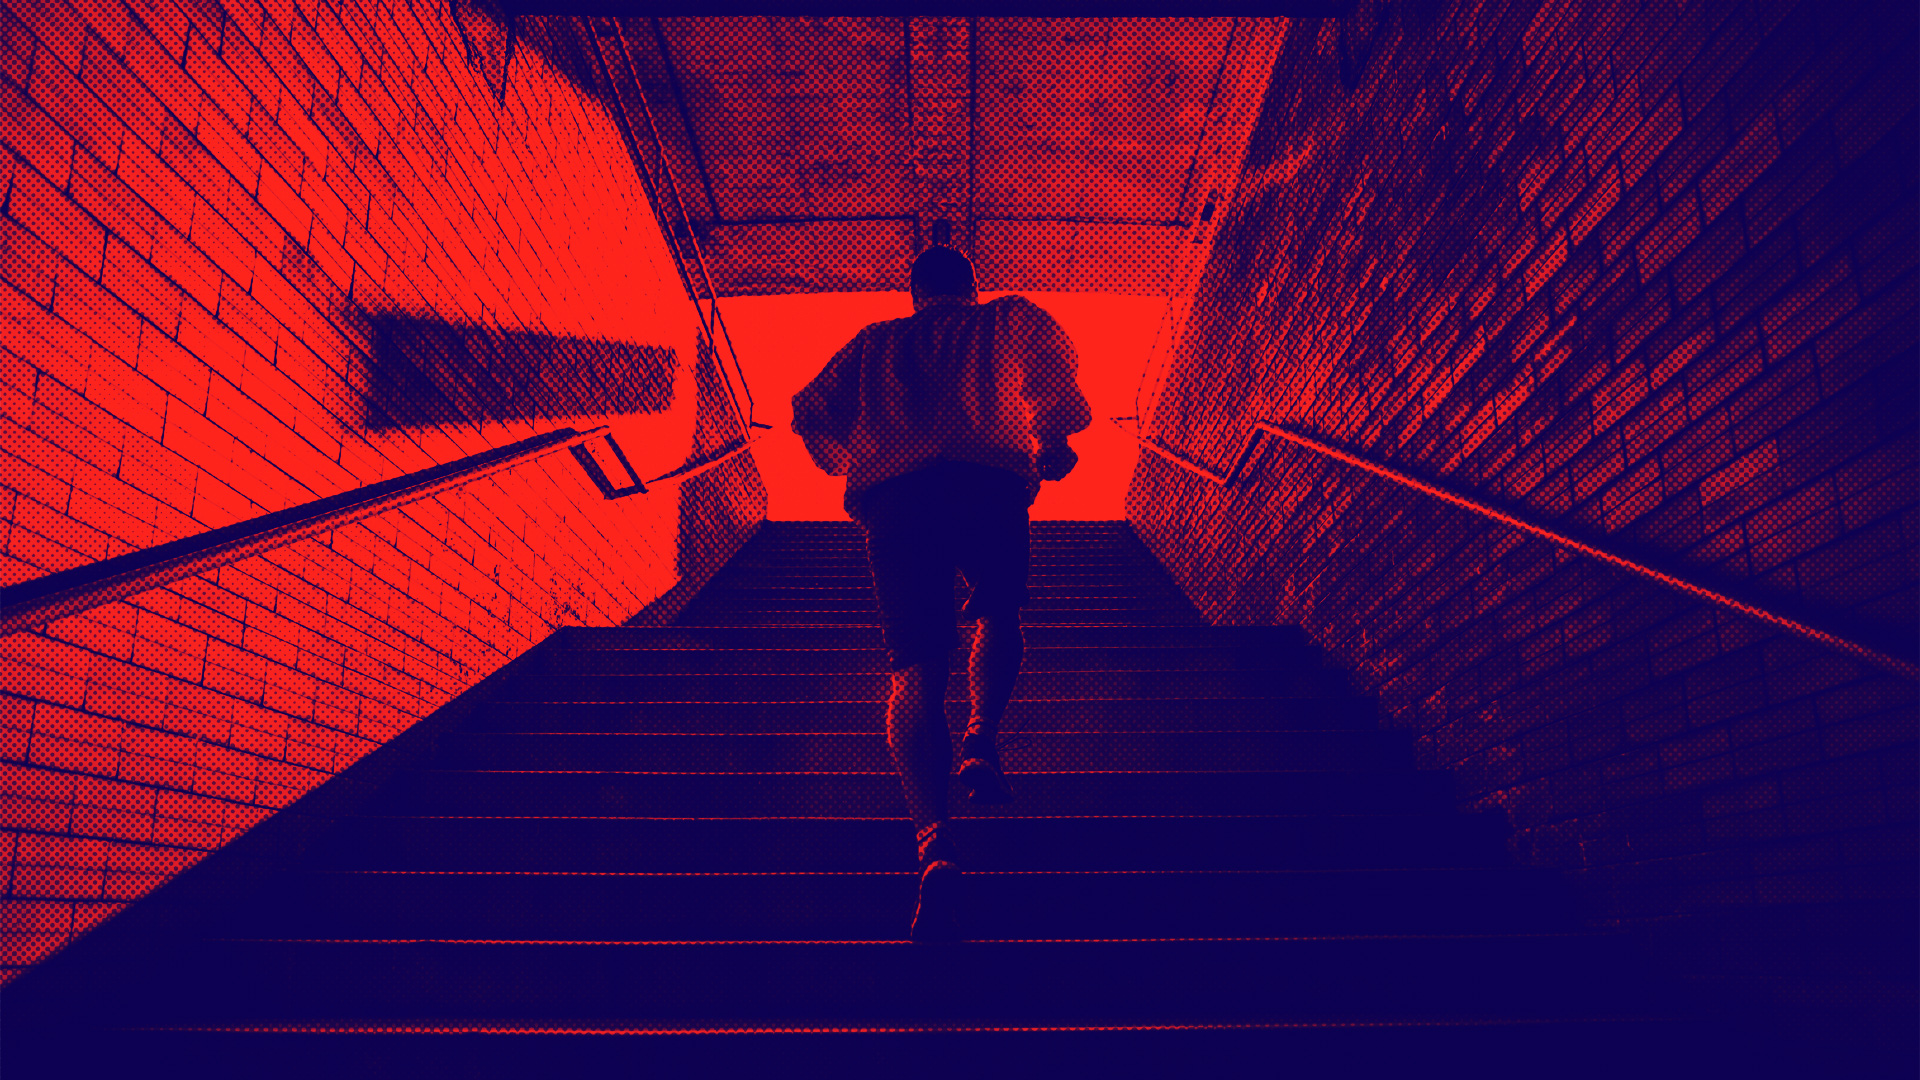 Man running up stairs image